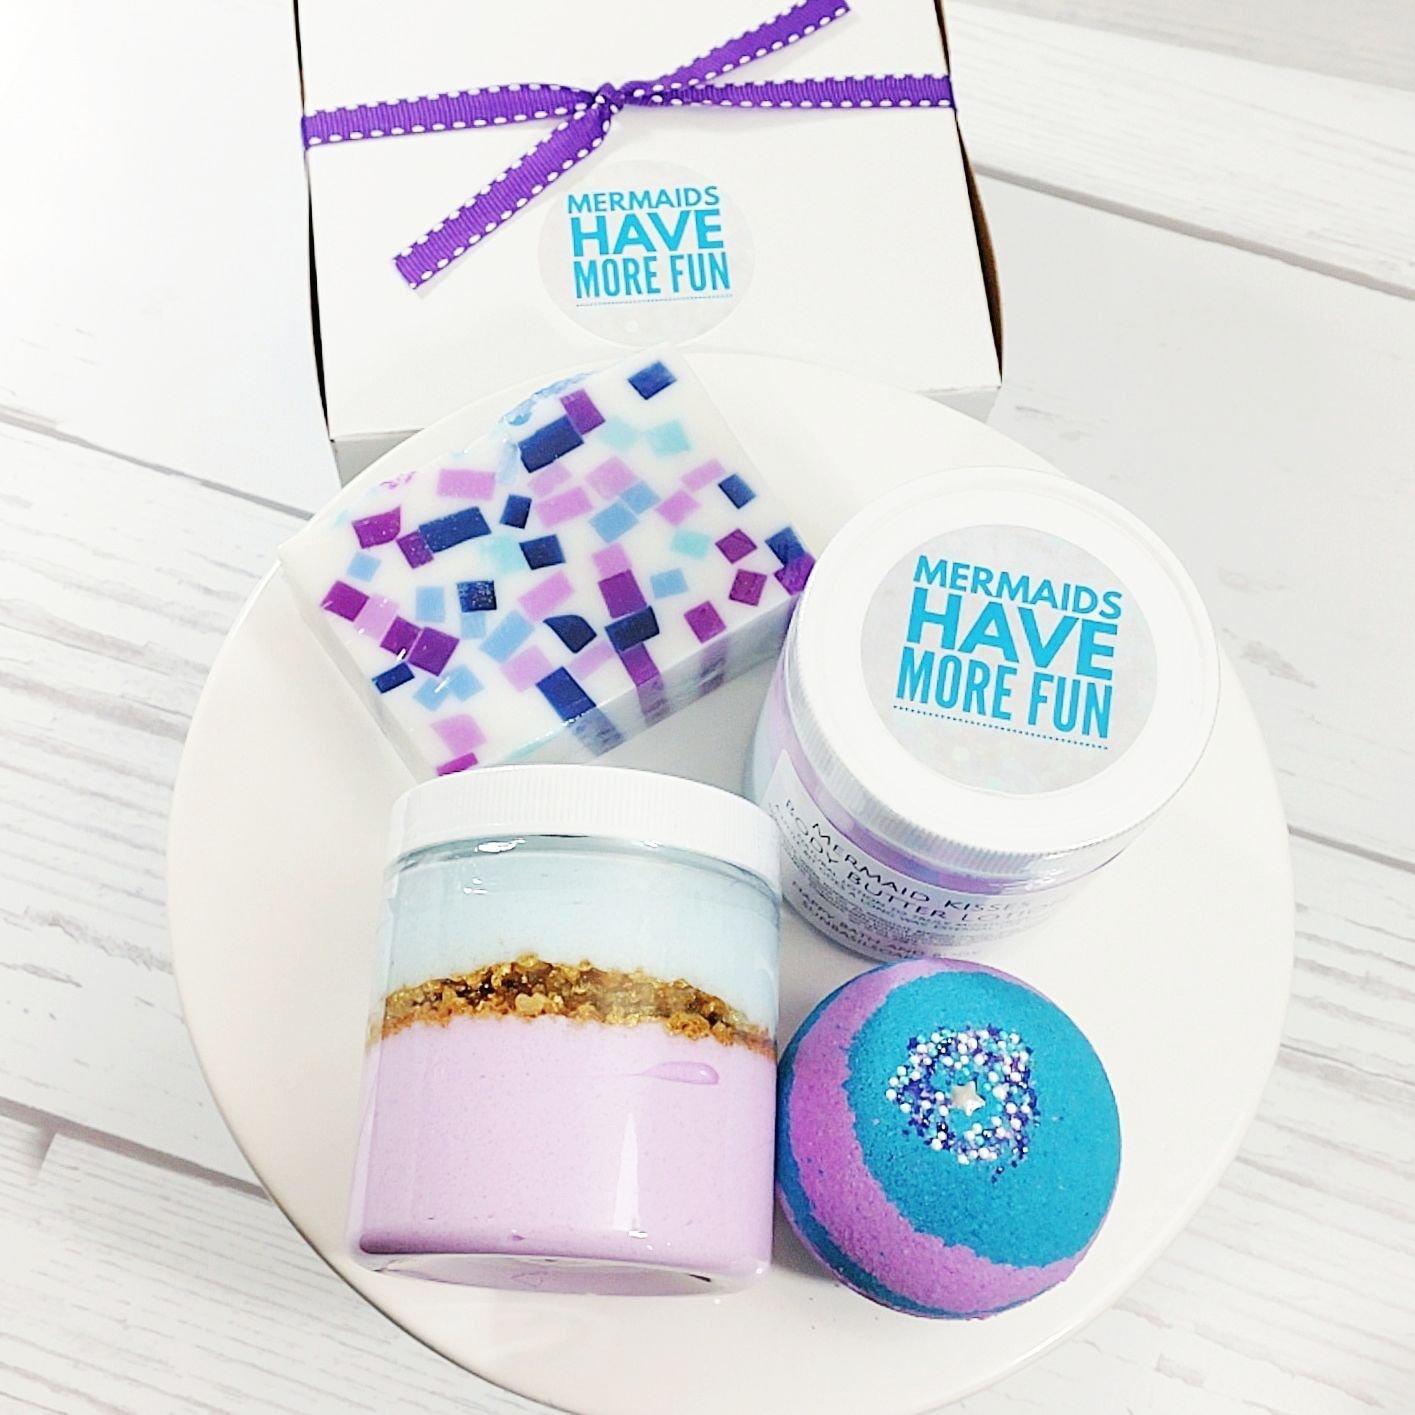 Mermaid Gifts for Women. Let's Be Mermaids Bath Boxed Spa Gift Set. Bath bomb. Body Scrub. Lotion